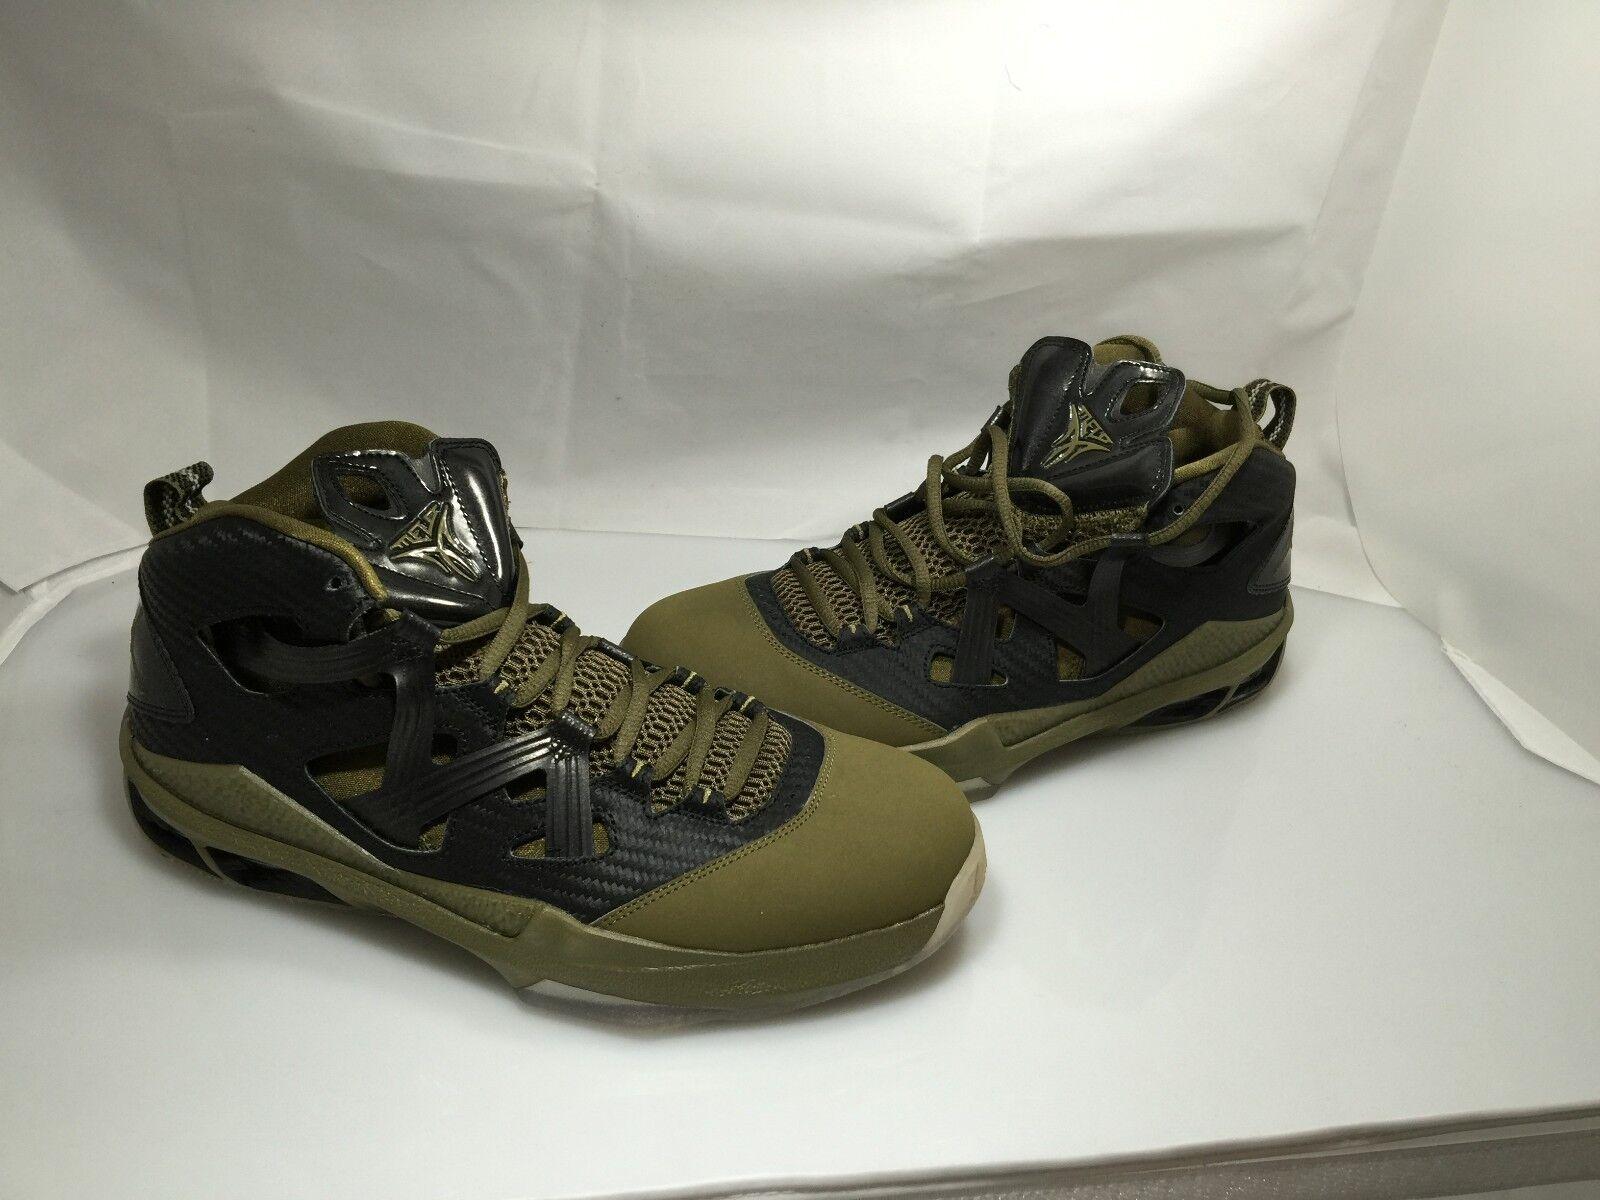 Nike Jordan Melo M9, Squadron Green, Comfortable best-selling model of the brand